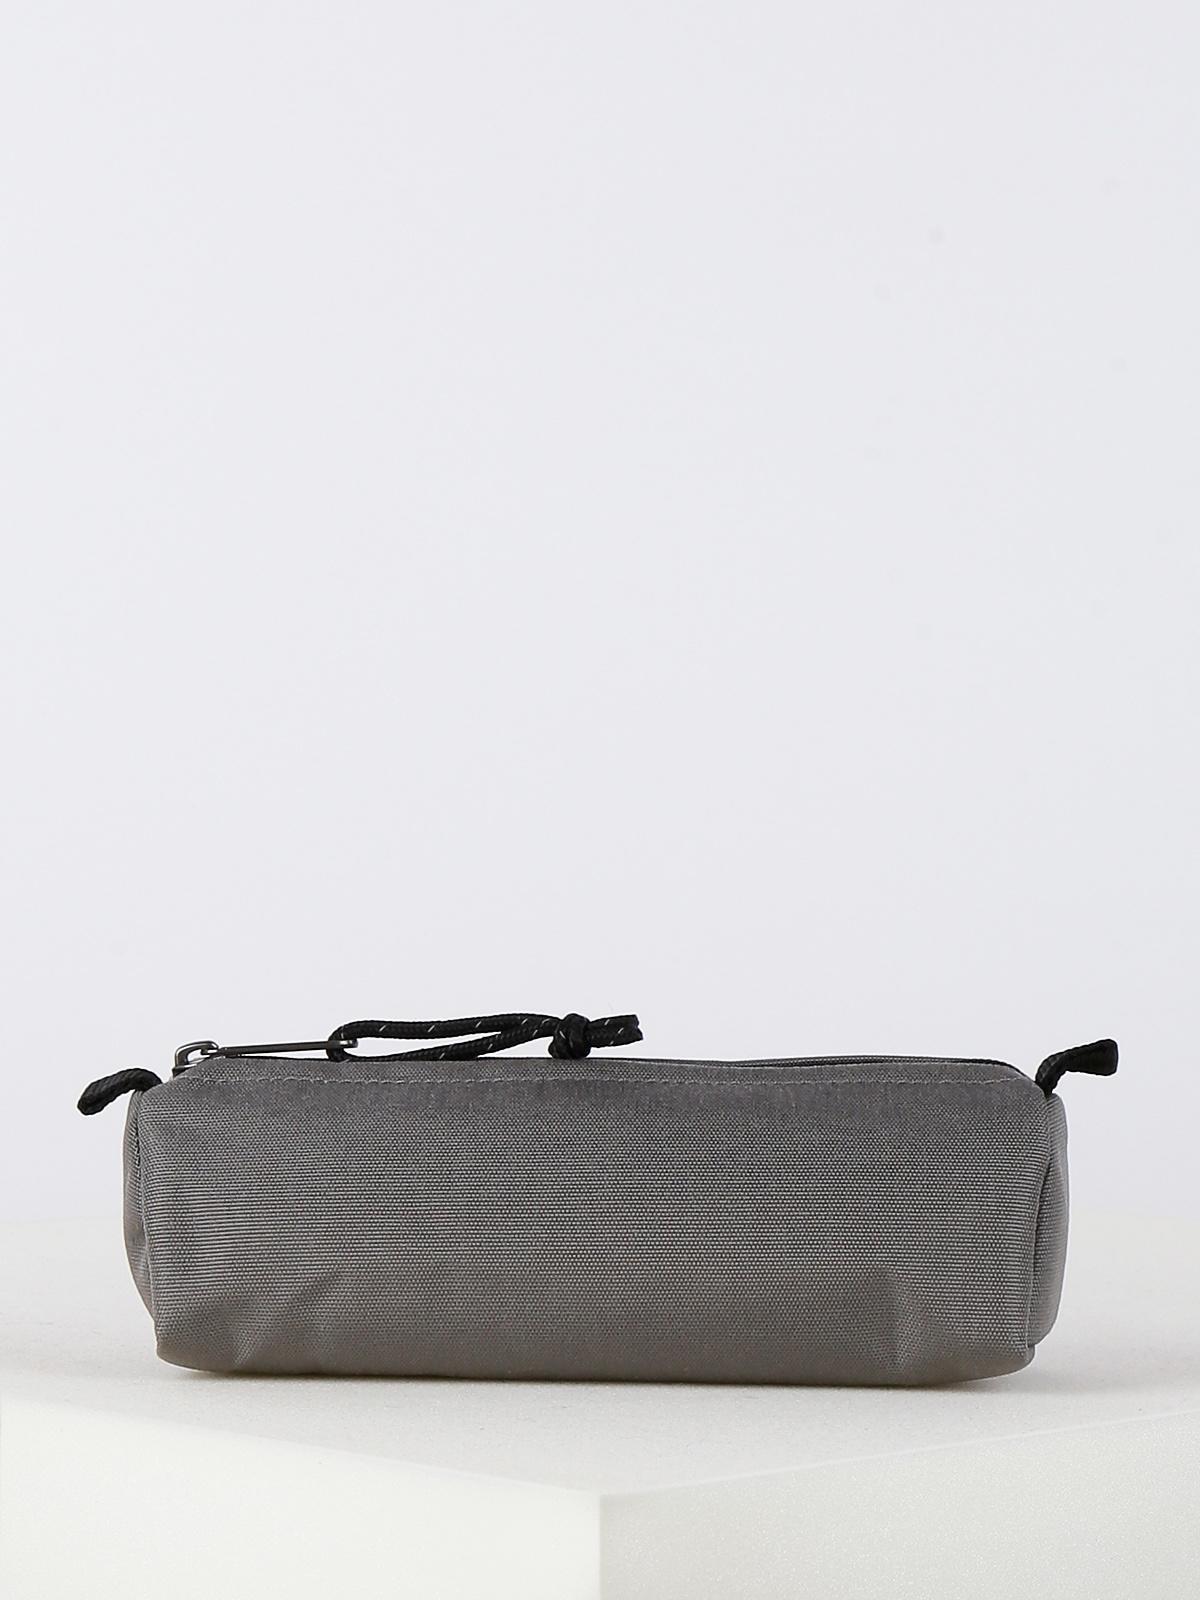 buy popular ffdc4 be867 Astuccio Benchmark Single 64S Silky Grey eastpak | MecShopping